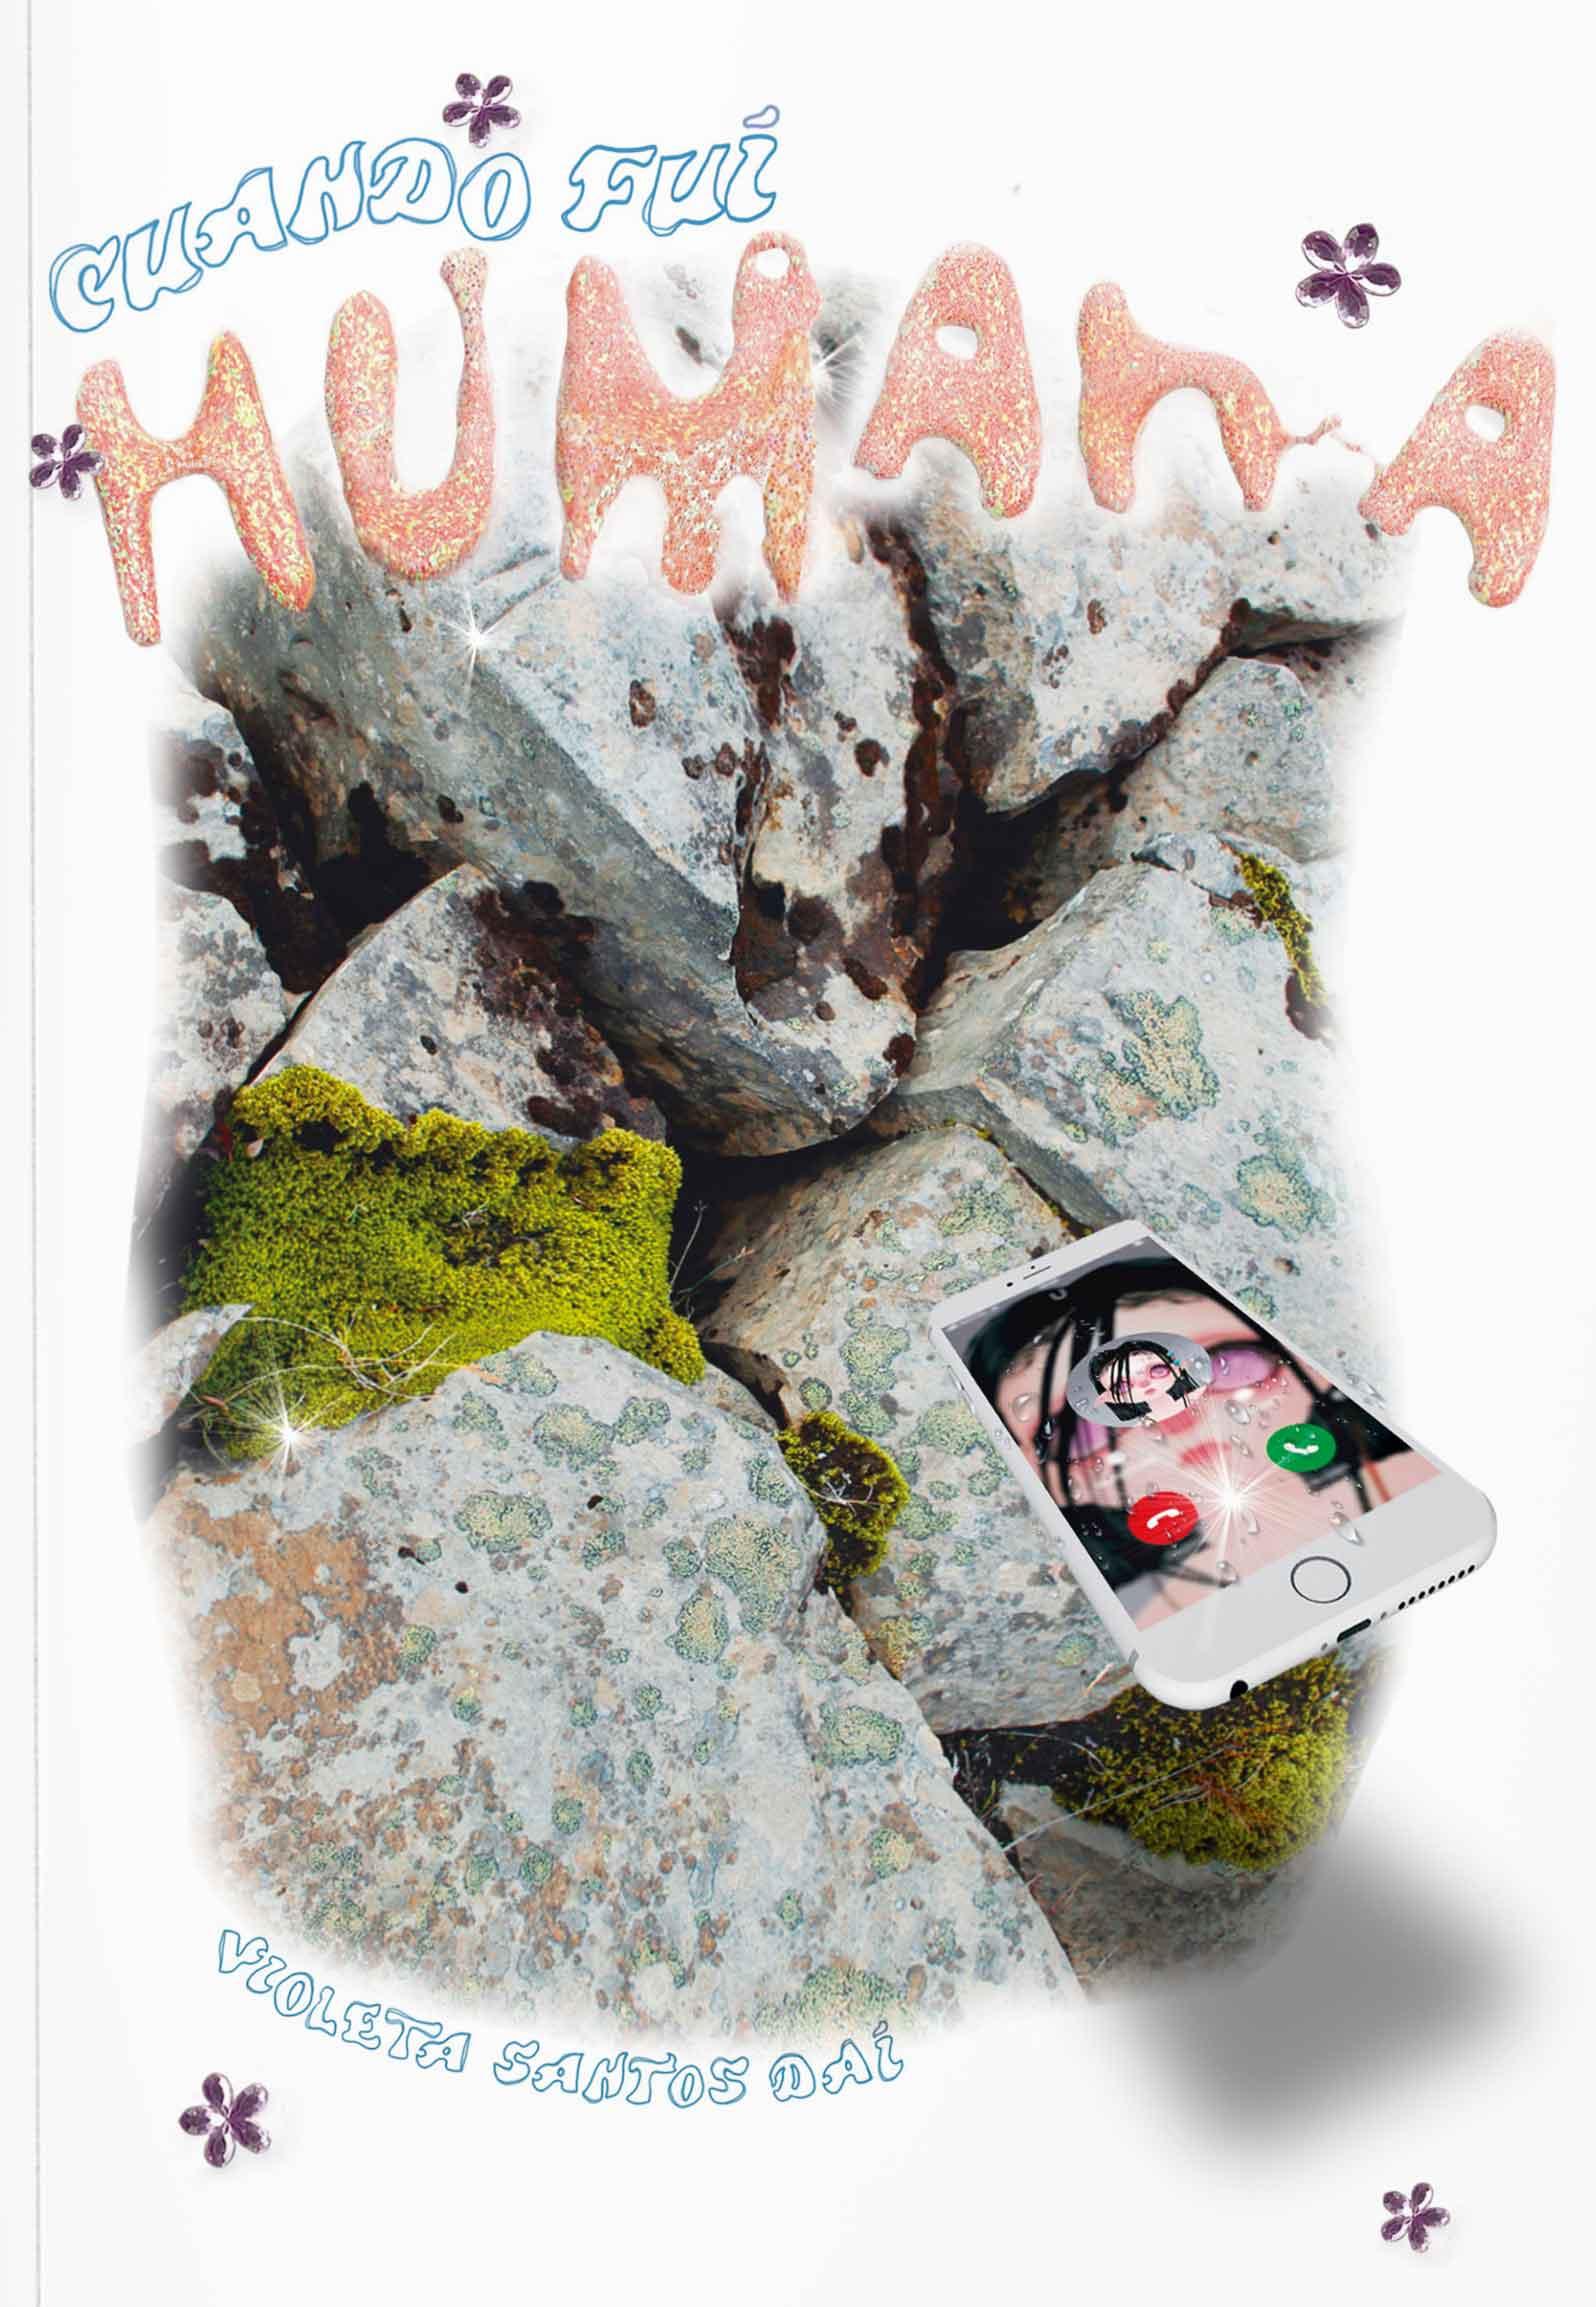 Libro 'Cuando fui Humana'